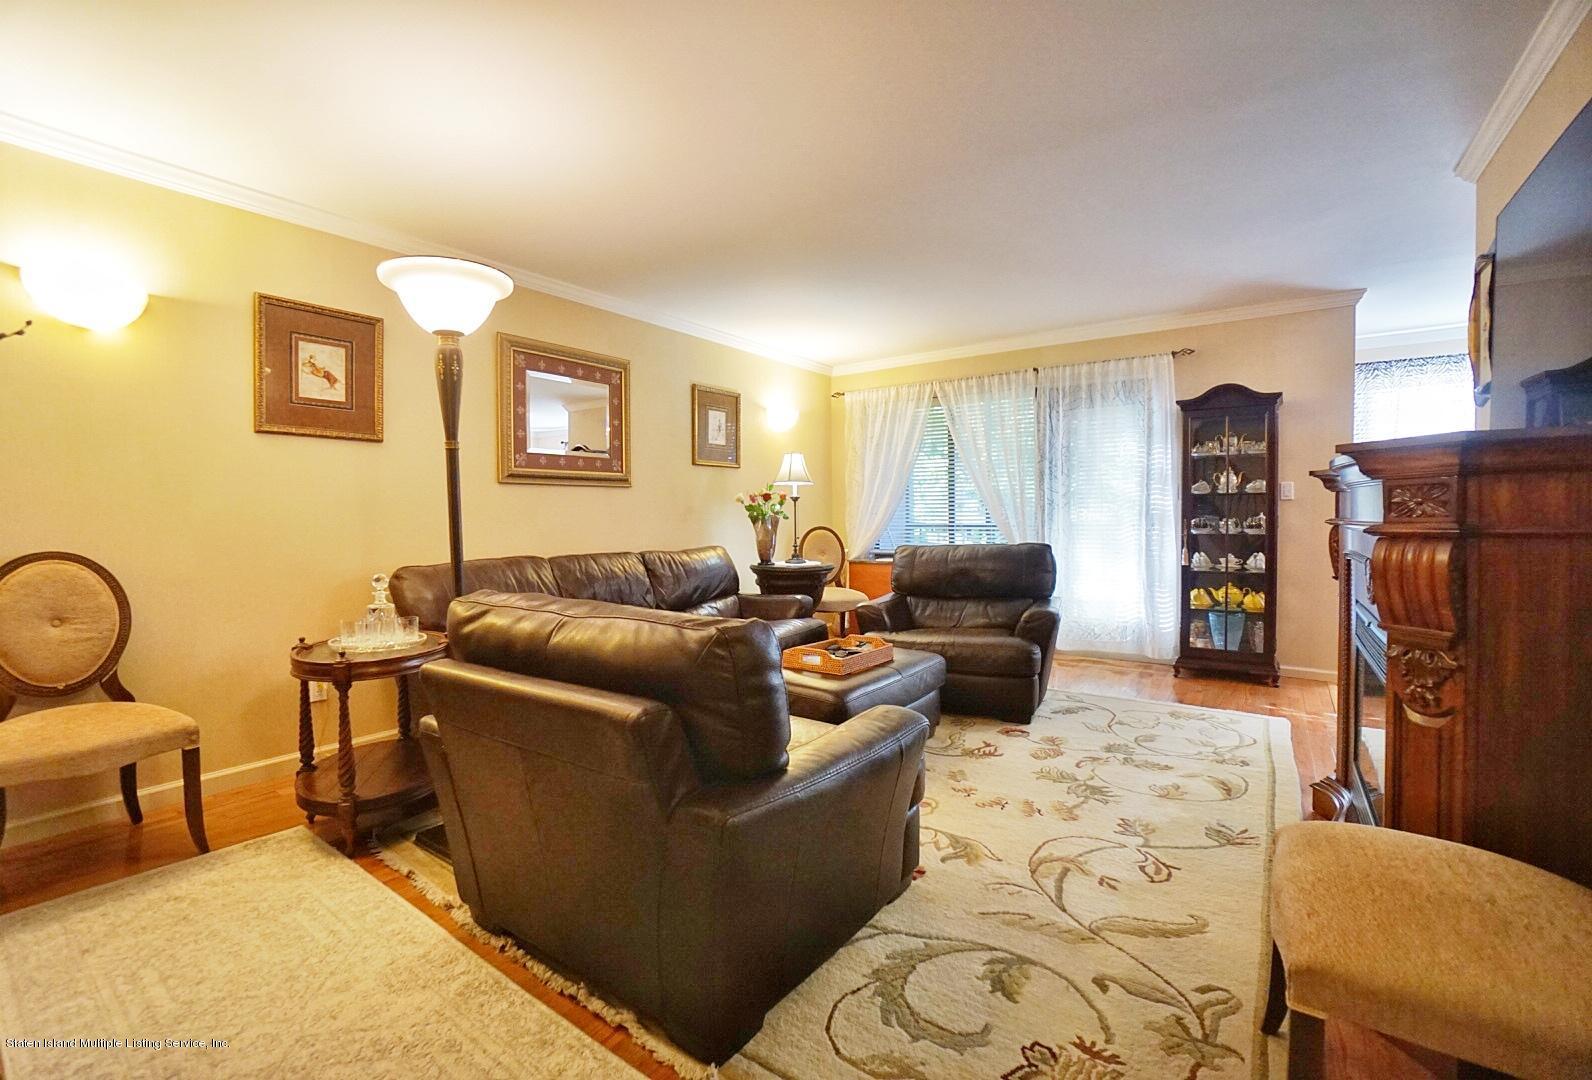 1f 40 Wellington Court,Staten Island,New York,10314,United States,2 Bedrooms Bedrooms,6 Rooms Rooms,2 BathroomsBathrooms,Residential,Wellington,1128970